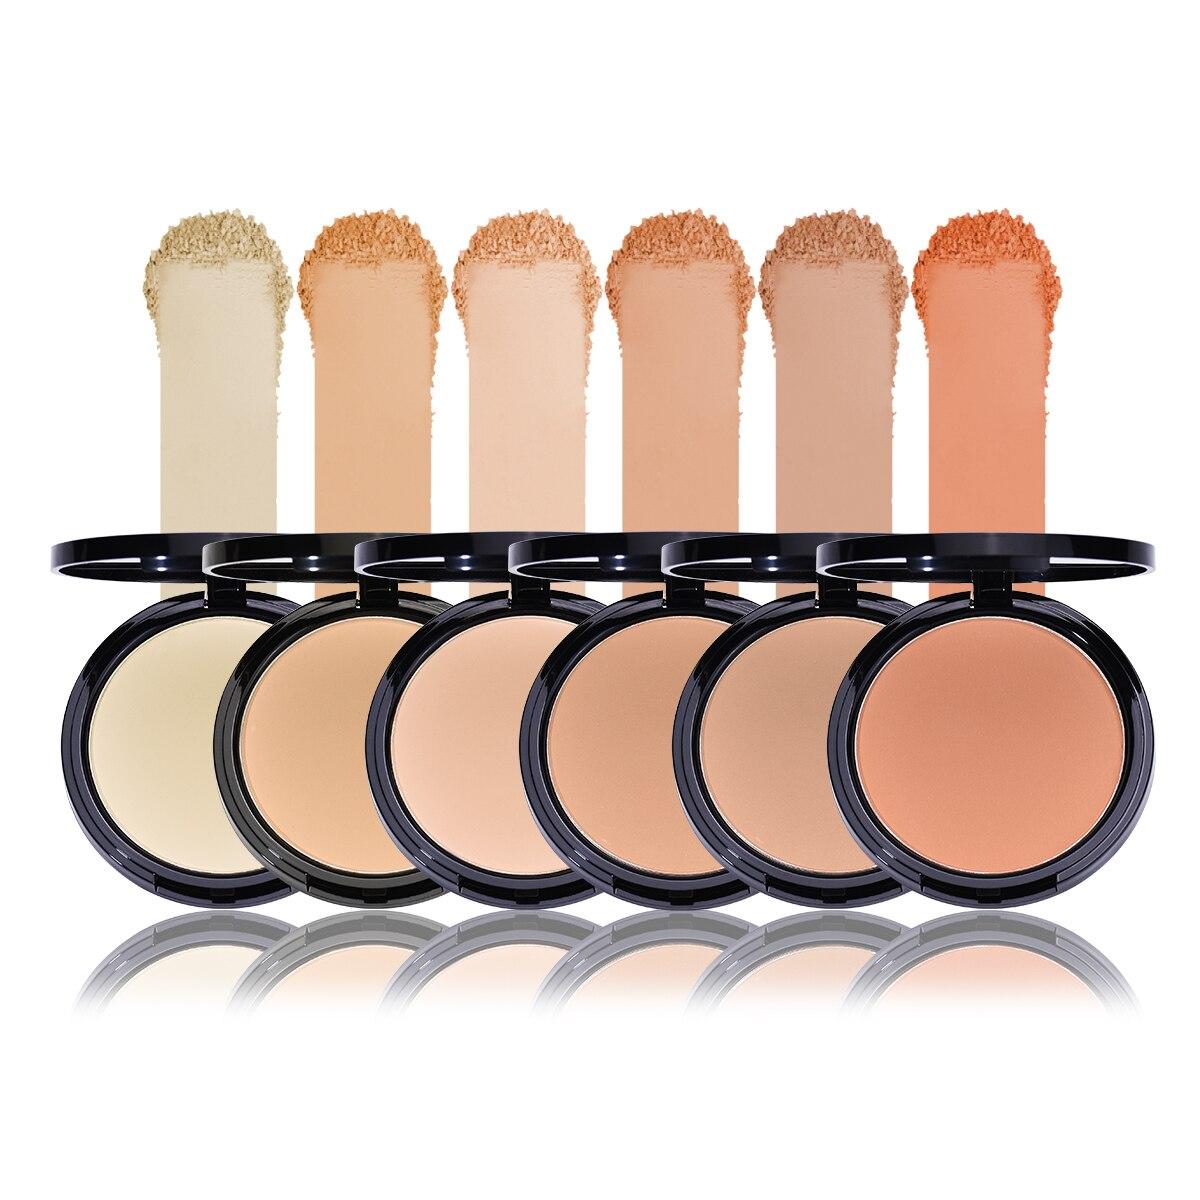 Compact Powder Oil Control Matte Makeup Setting Pressed Powder Pores Invisible Mate Make Up Natural Finish Cosmetics